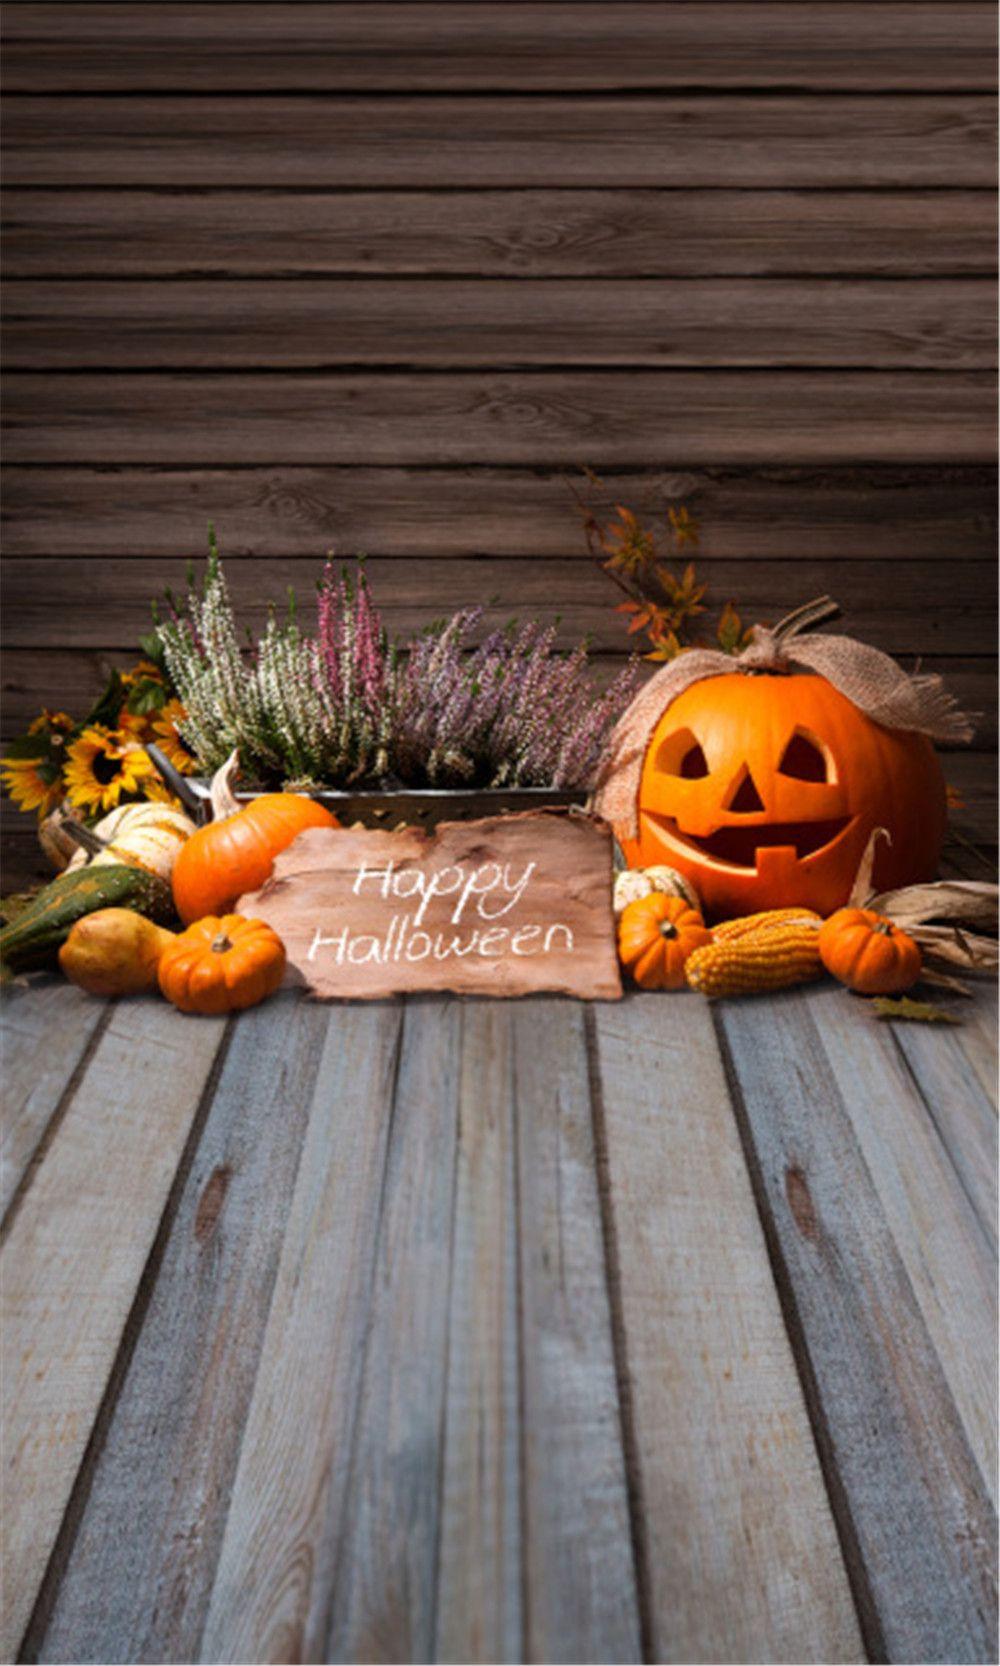 2018 Happy Halloween Backdrop Plank Wood Flooring Pumpkin Lantern Baby Newborn Studio Photo